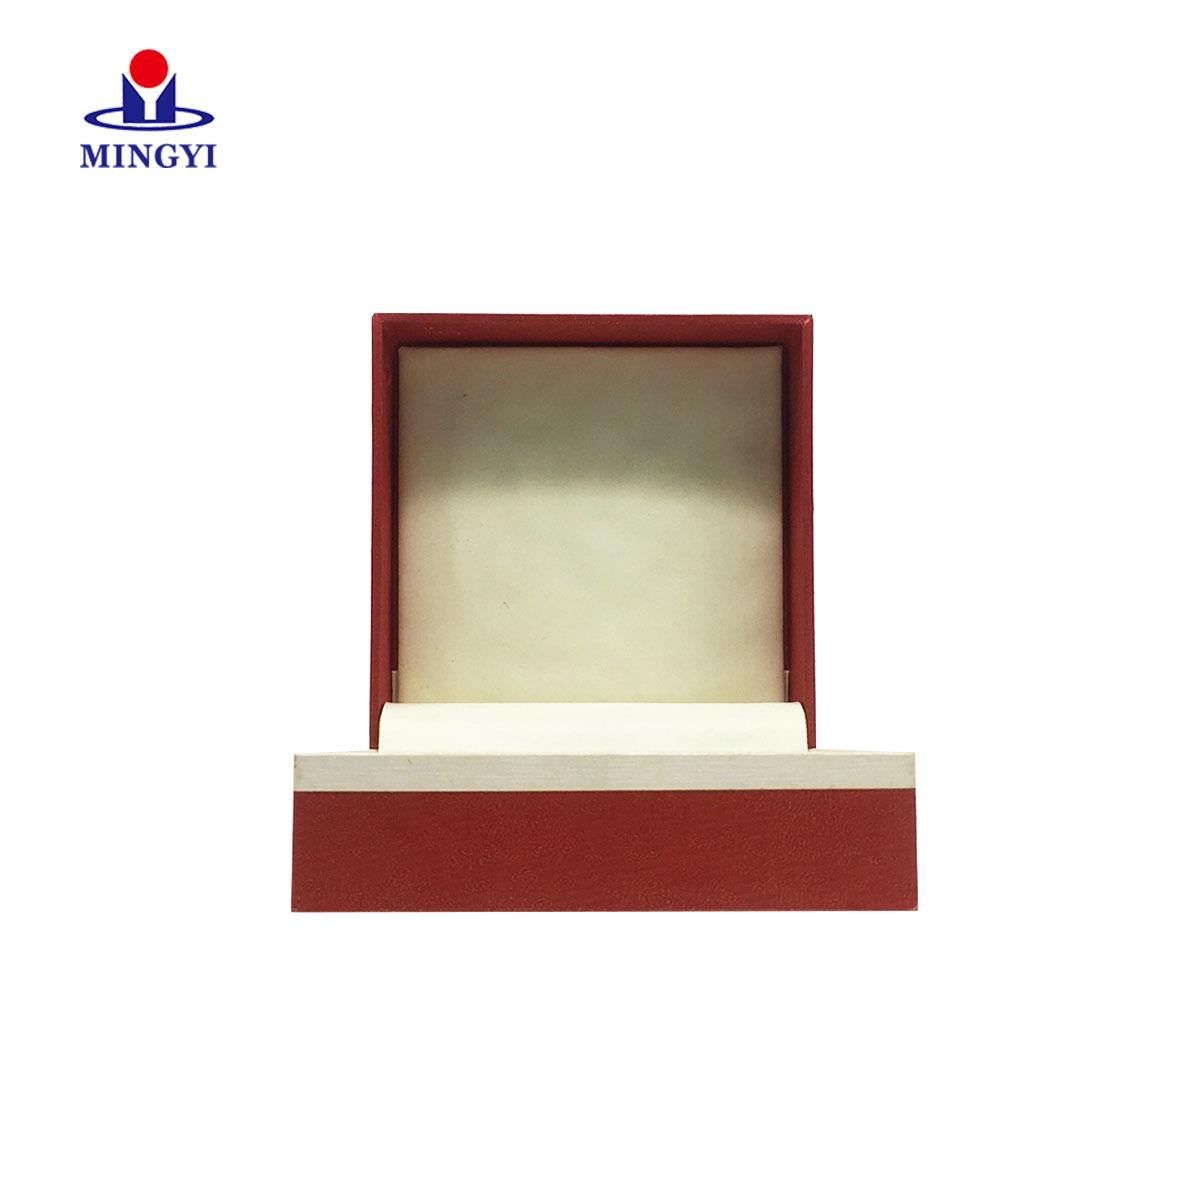 Luxury jewelry clam shell gift packaging box custom logo make in Dongguan china